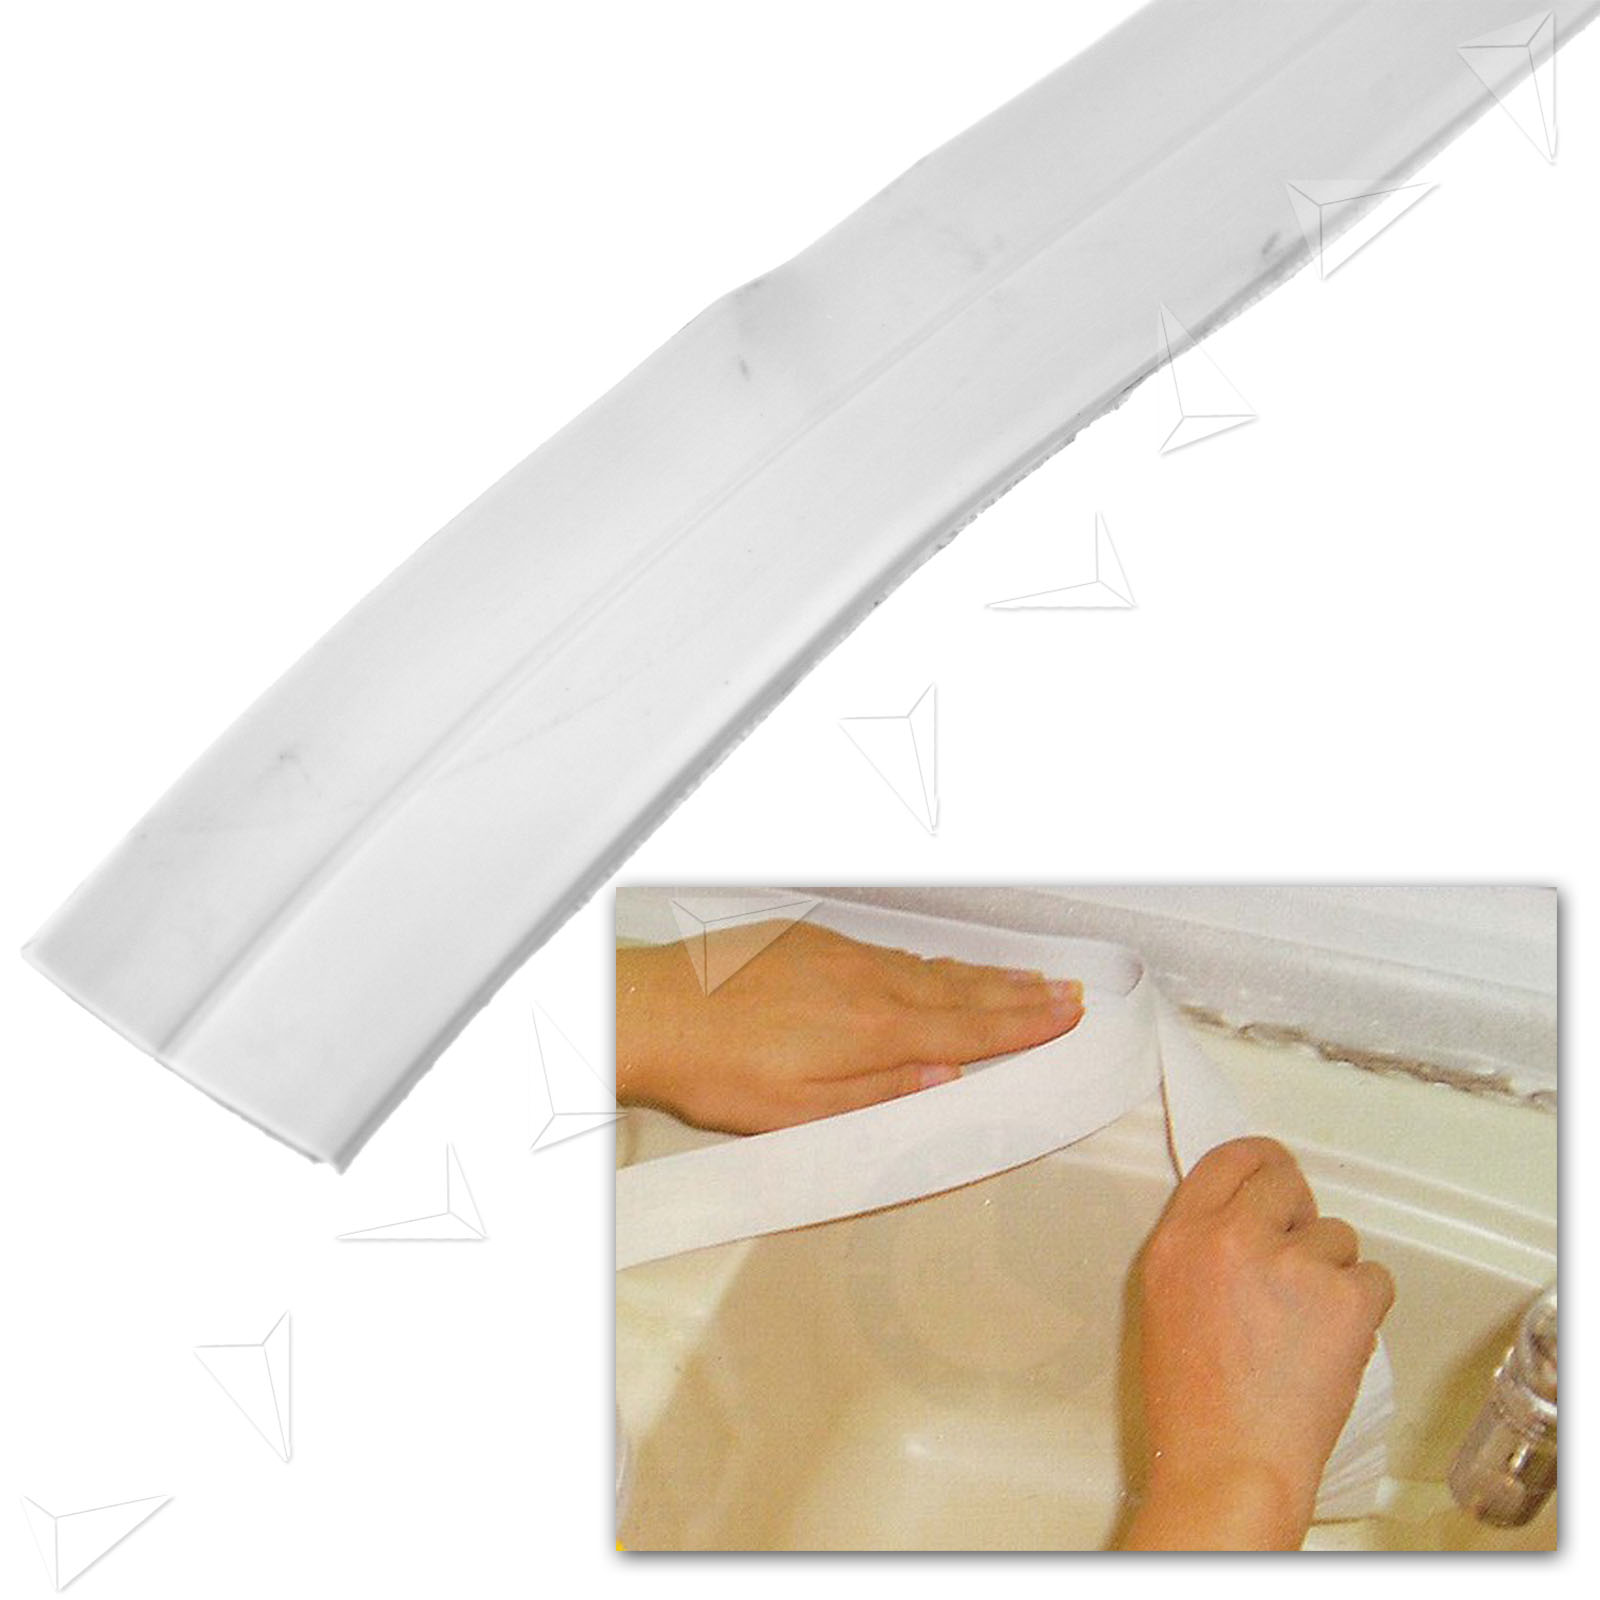 22 38mm x 5m bath and wall sealing strip bath sink basin. Black Bedroom Furniture Sets. Home Design Ideas